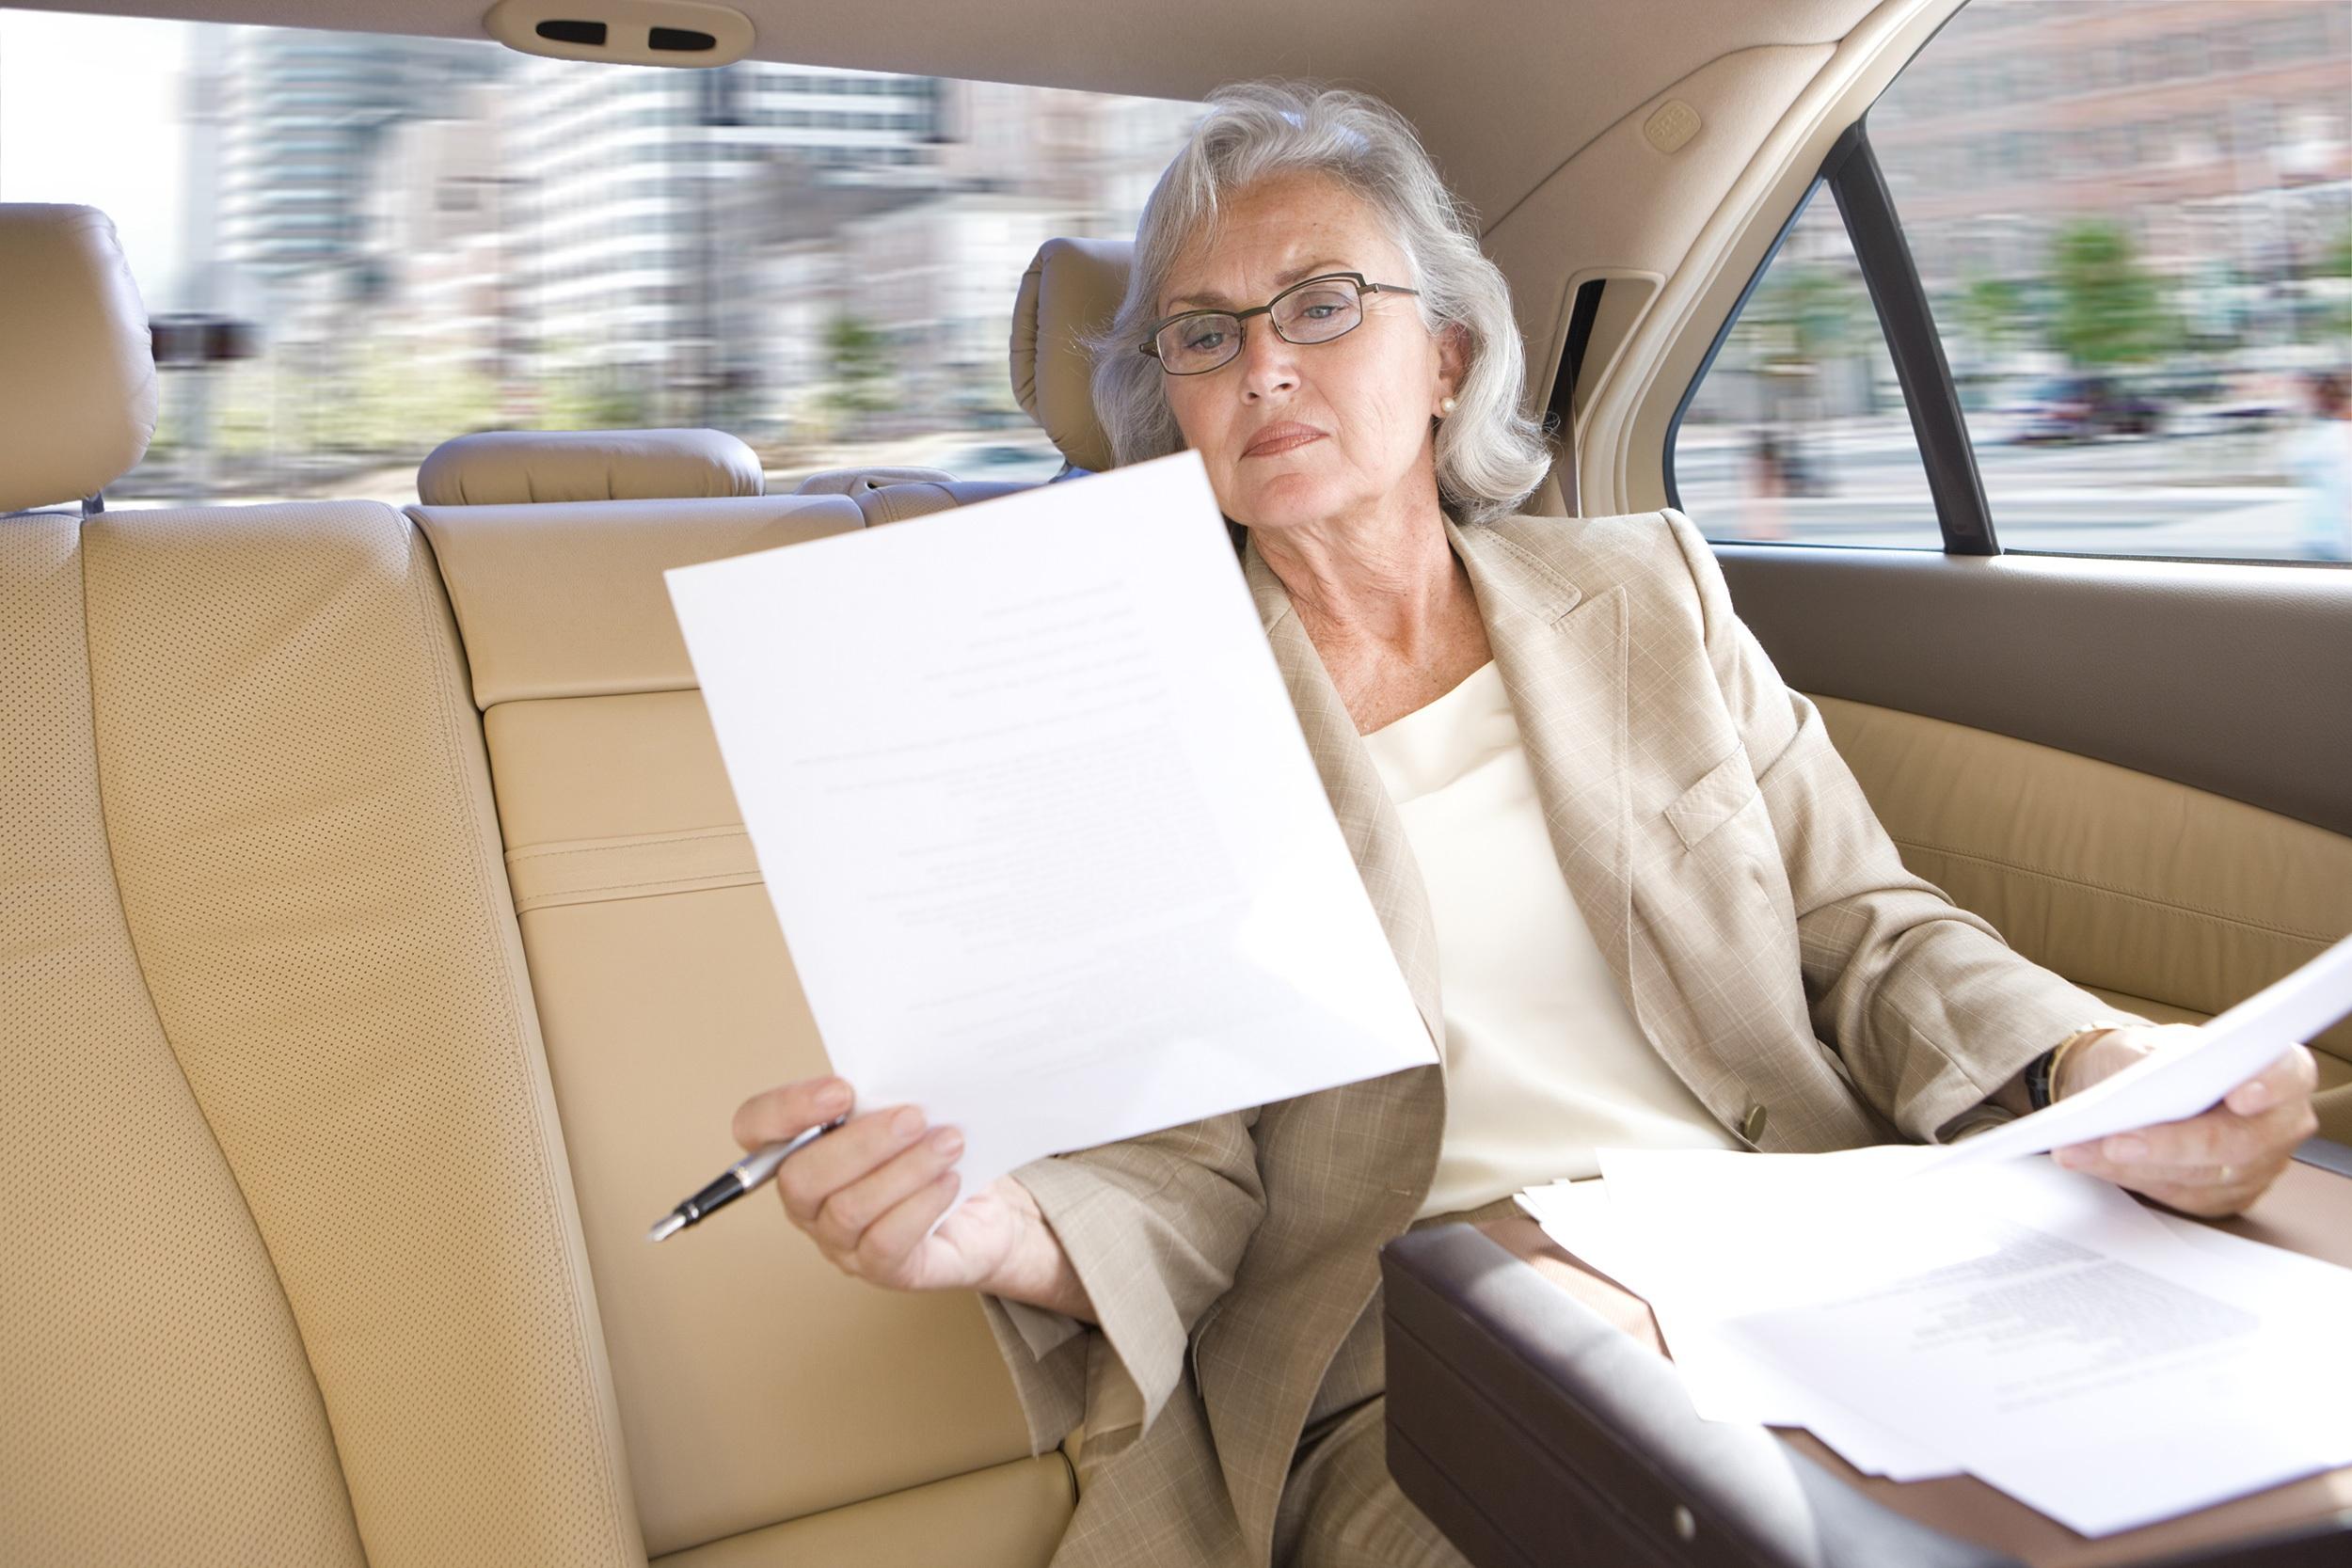 Executive in car reading